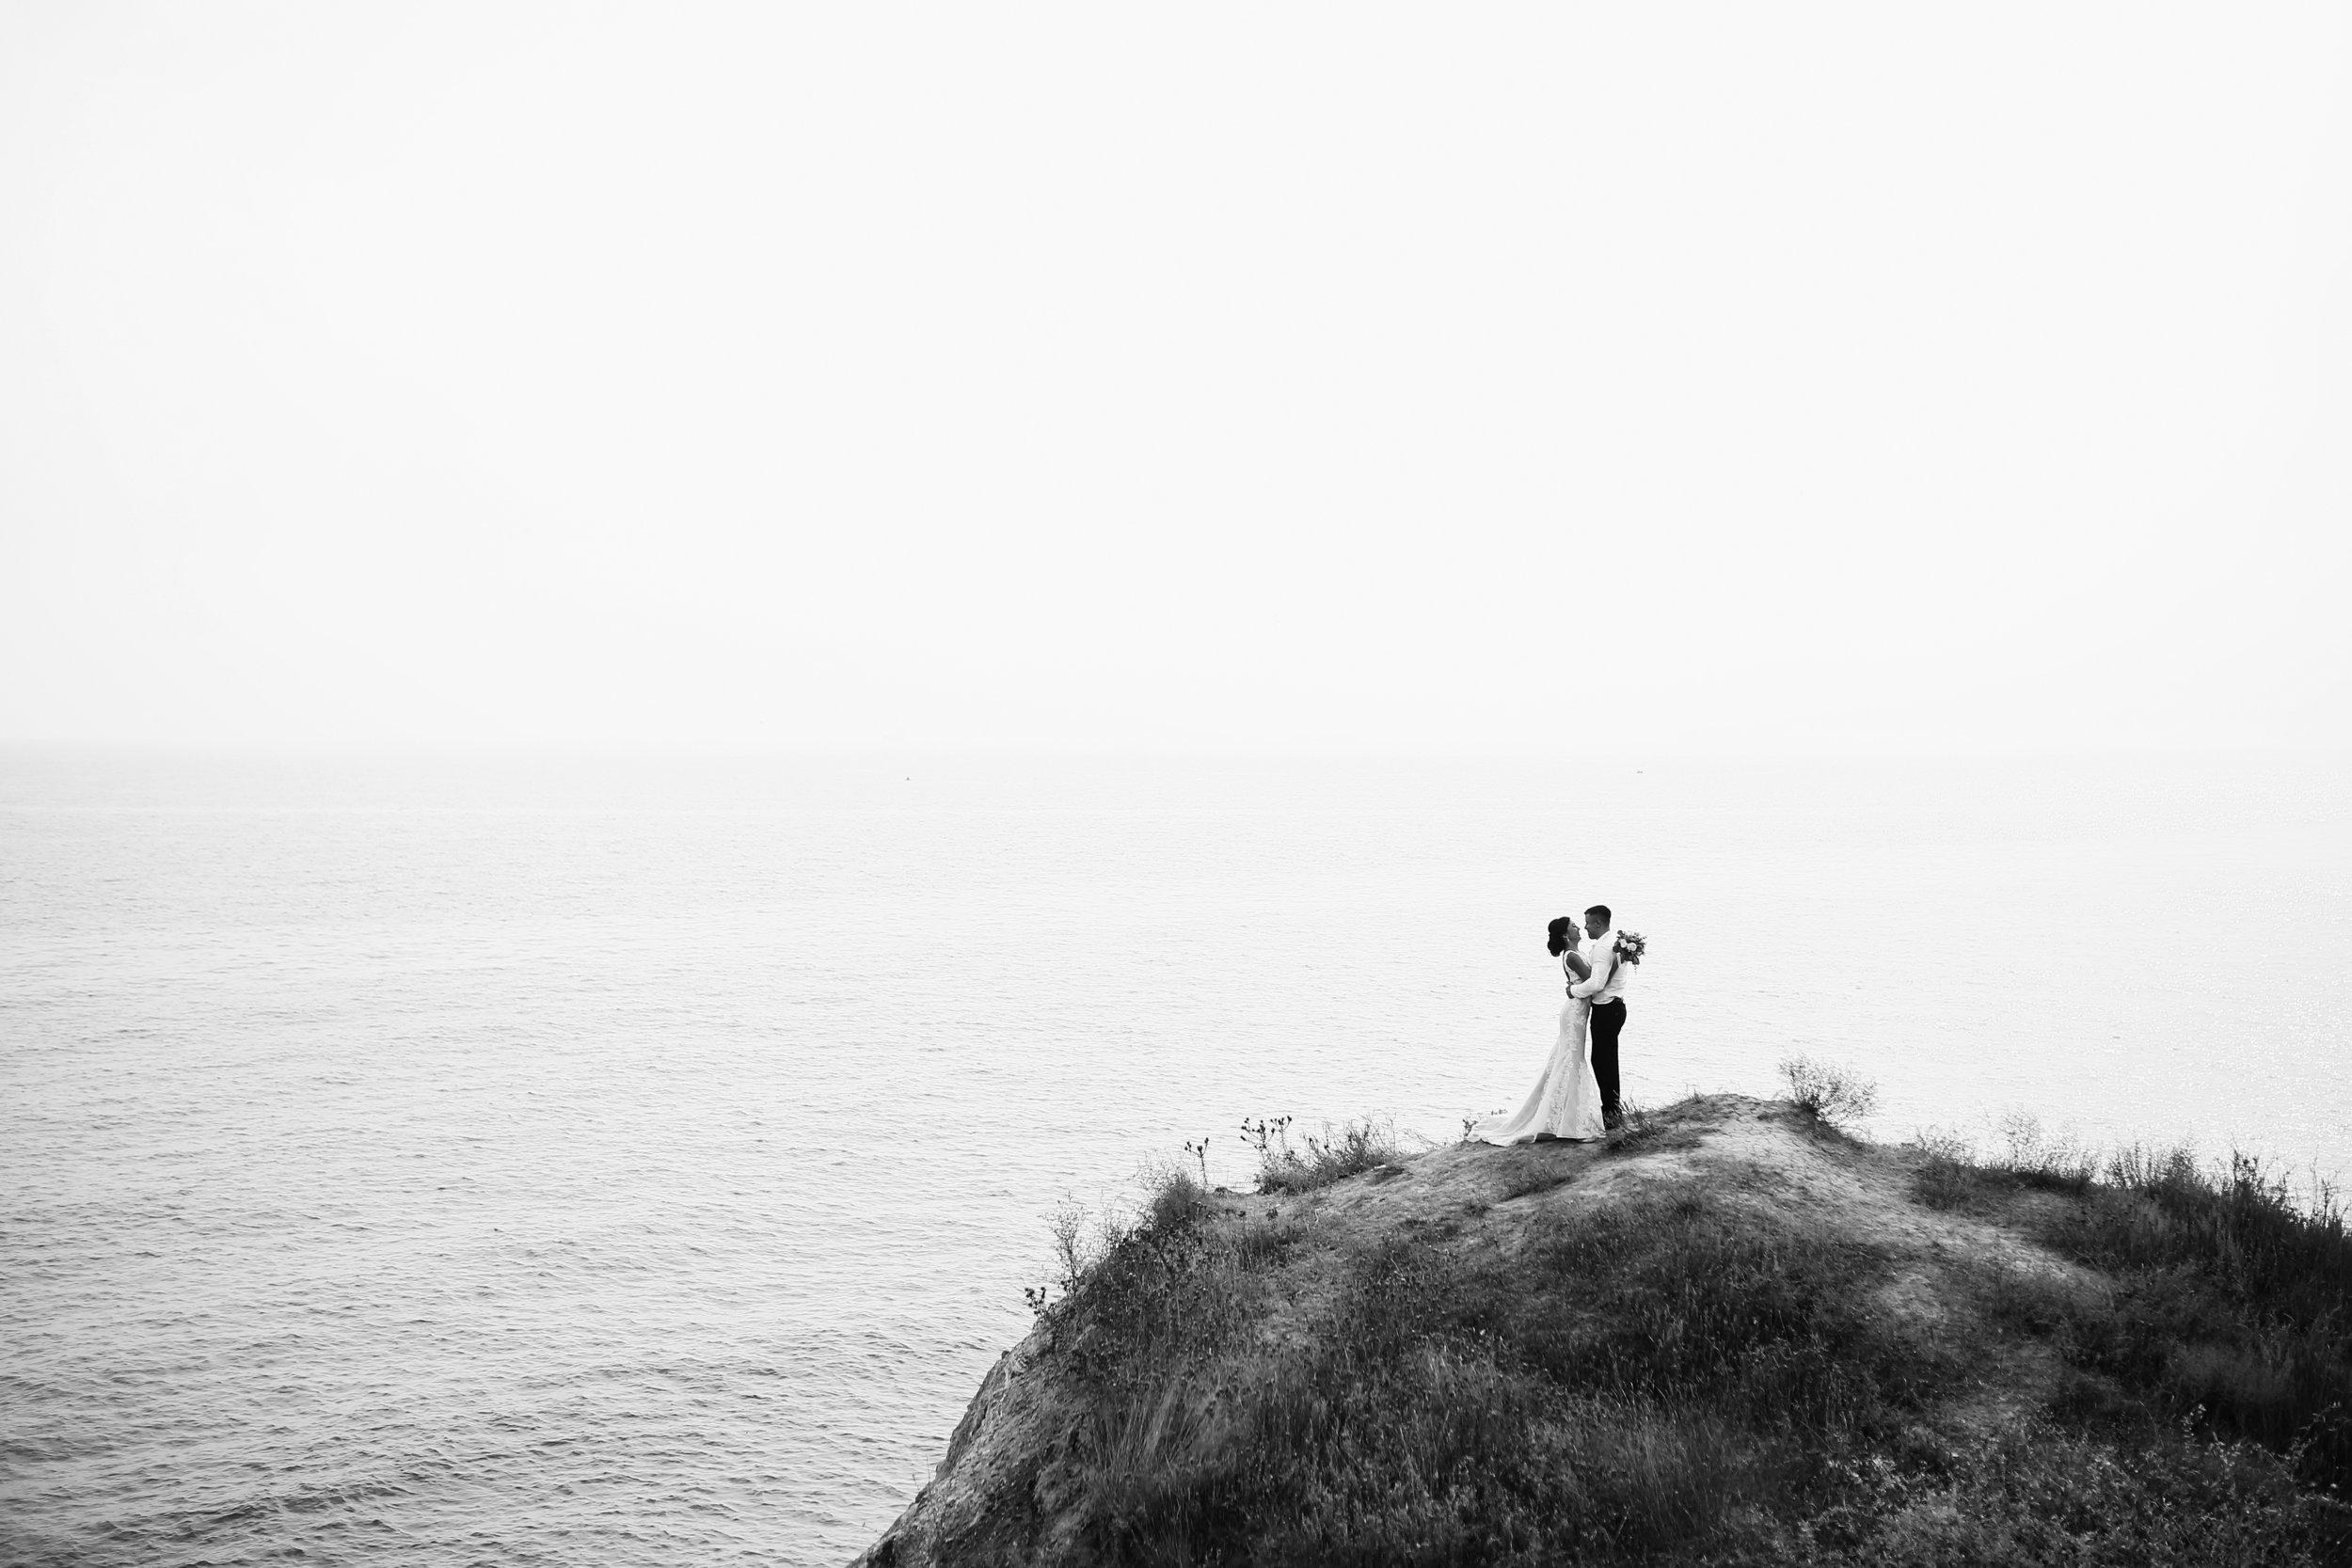 B&W cliff pic.jpg